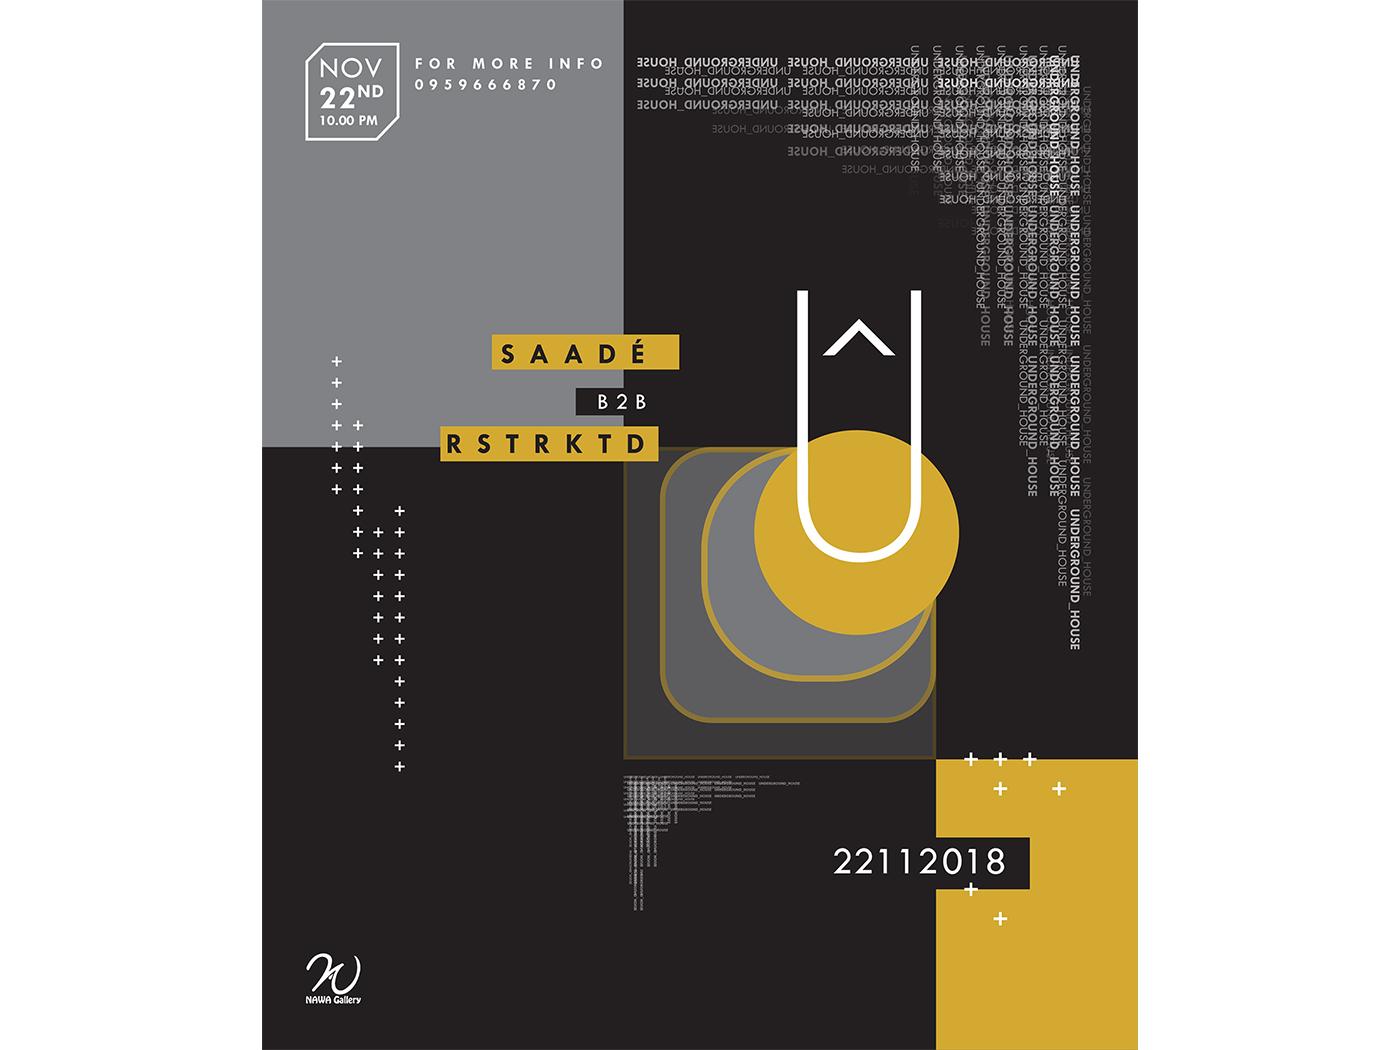 UGH-22112018 Poster vector event techno music syria poster design graphic graphic design